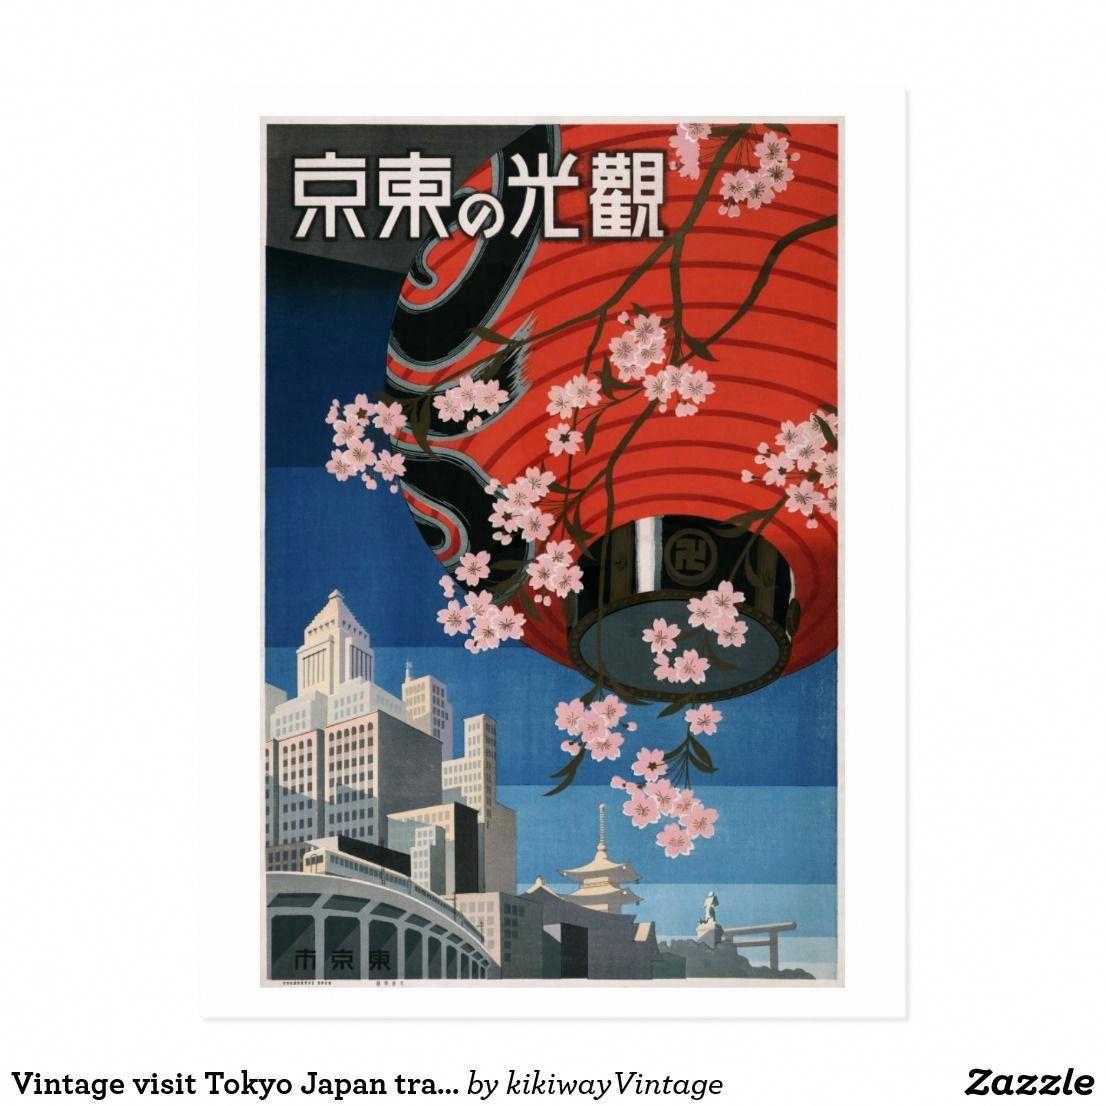 Vintage Visit Tokyo Japan Travel Tourism Postcard Zazzle Com Vintage Posters Travel Posters Posters Art Prints